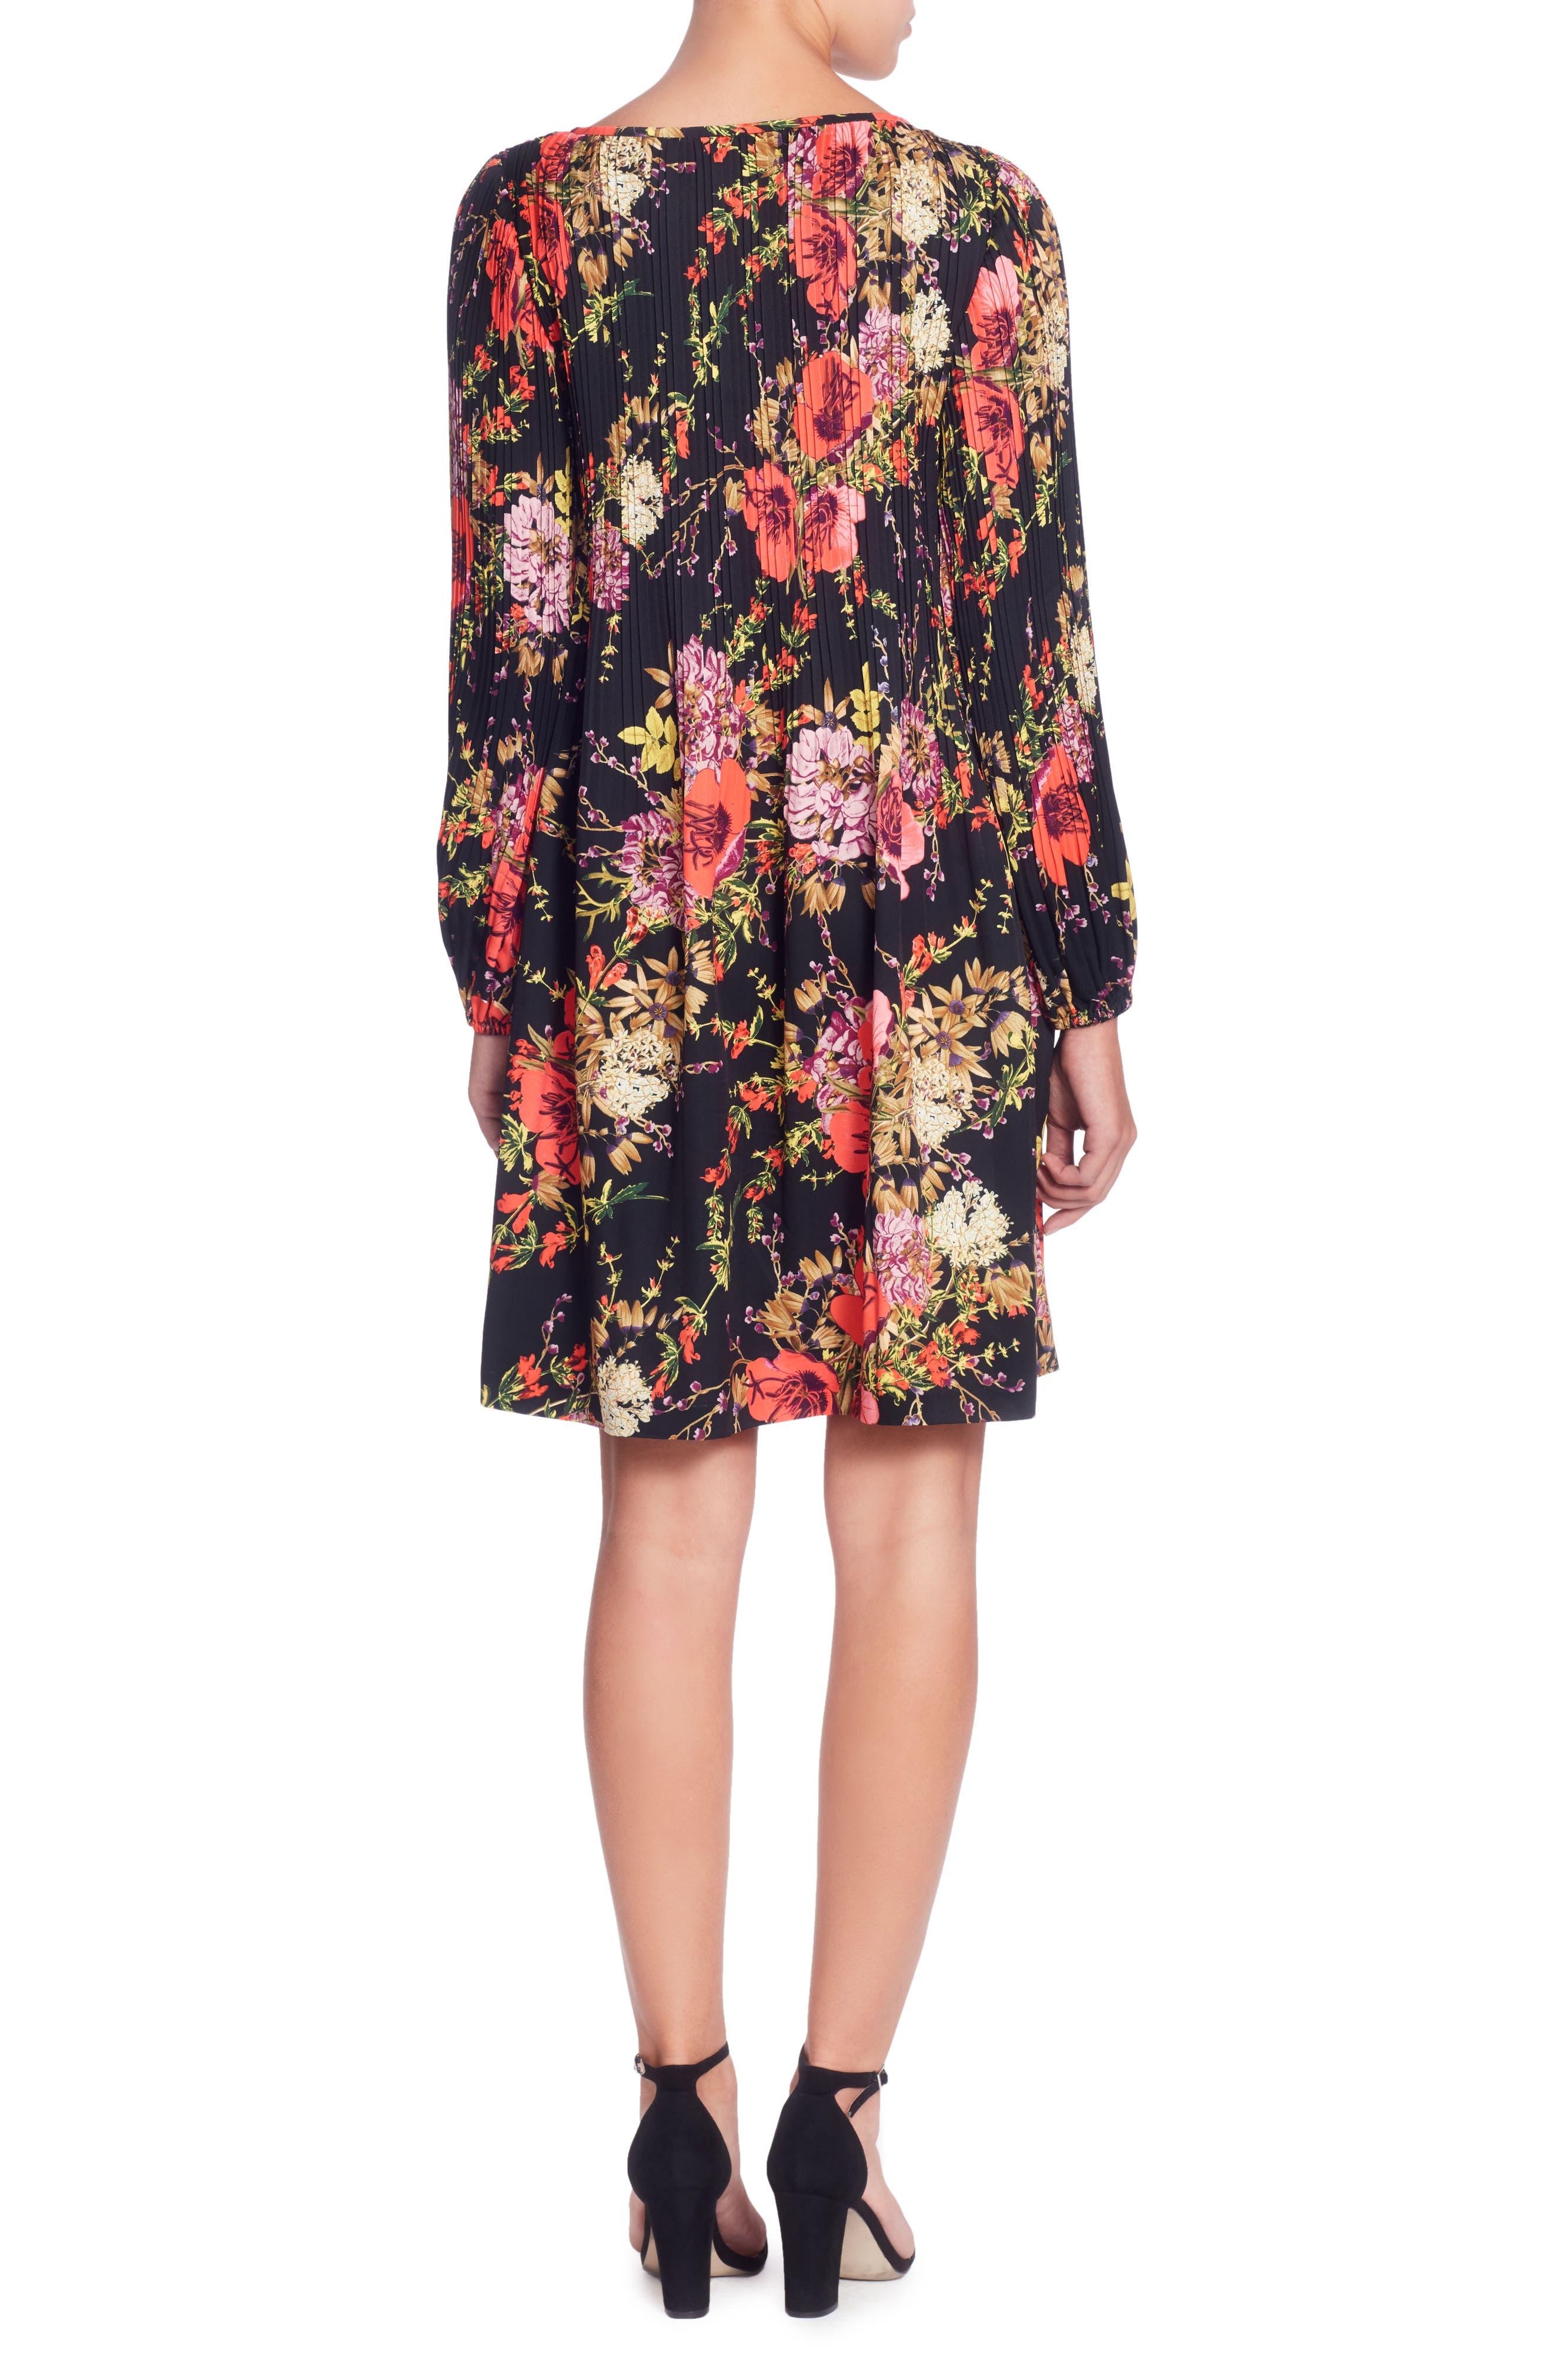 Petra Floral Print Dress,                             Alternate thumbnail 2, color,                             Ethereal Garden Black